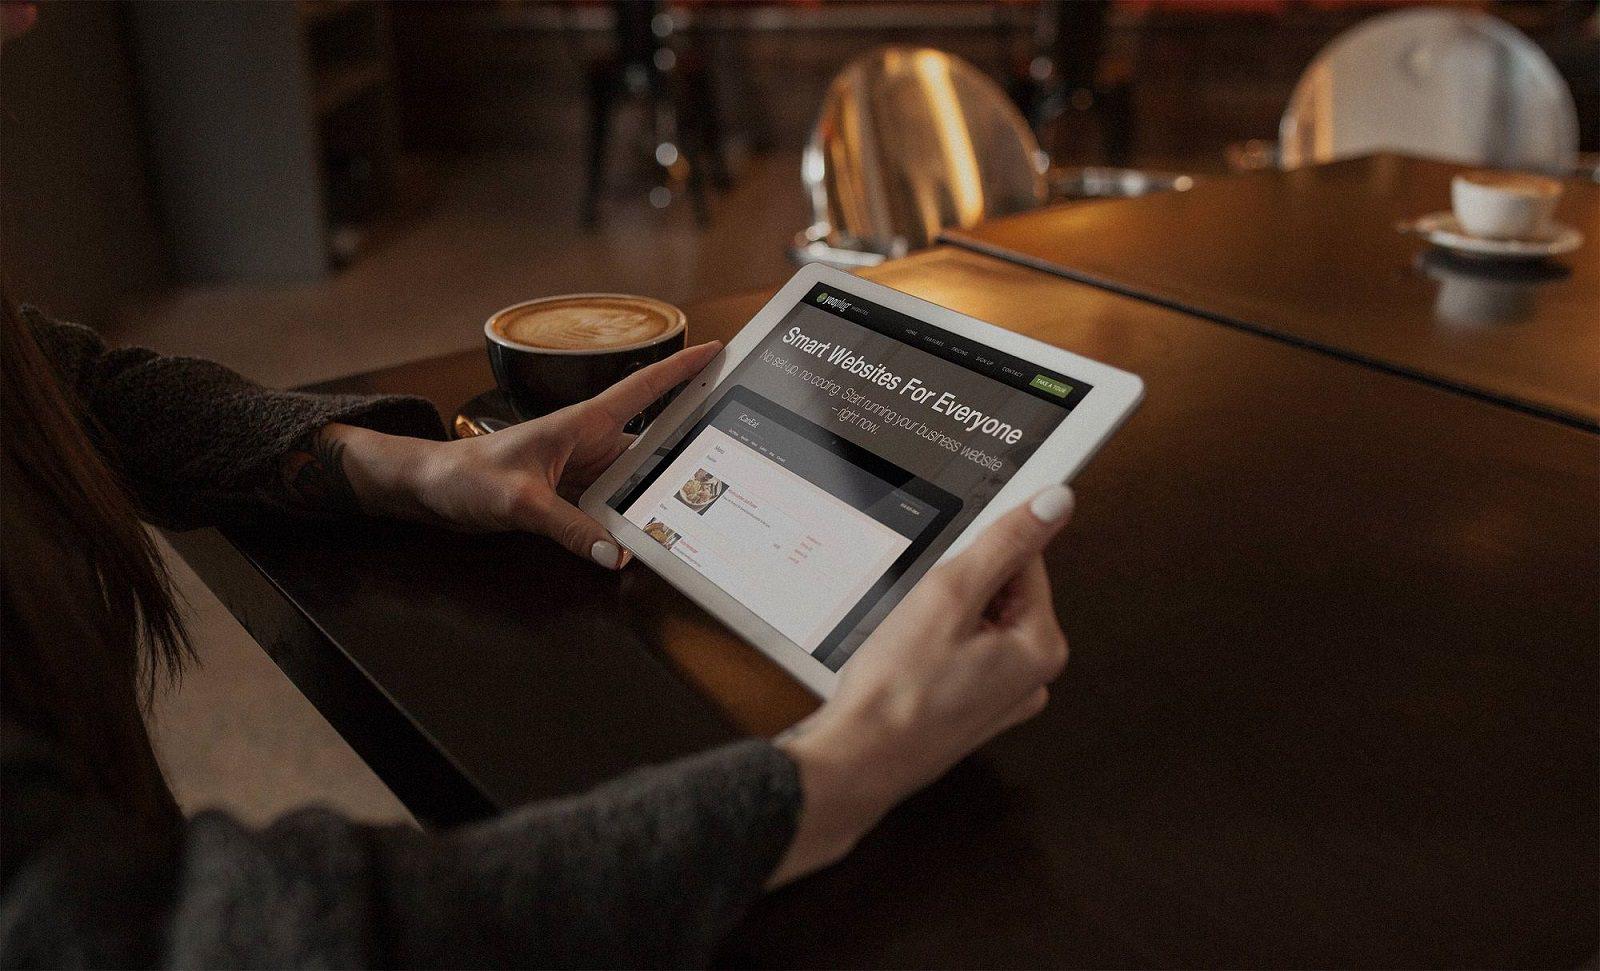 Smart web design solutions